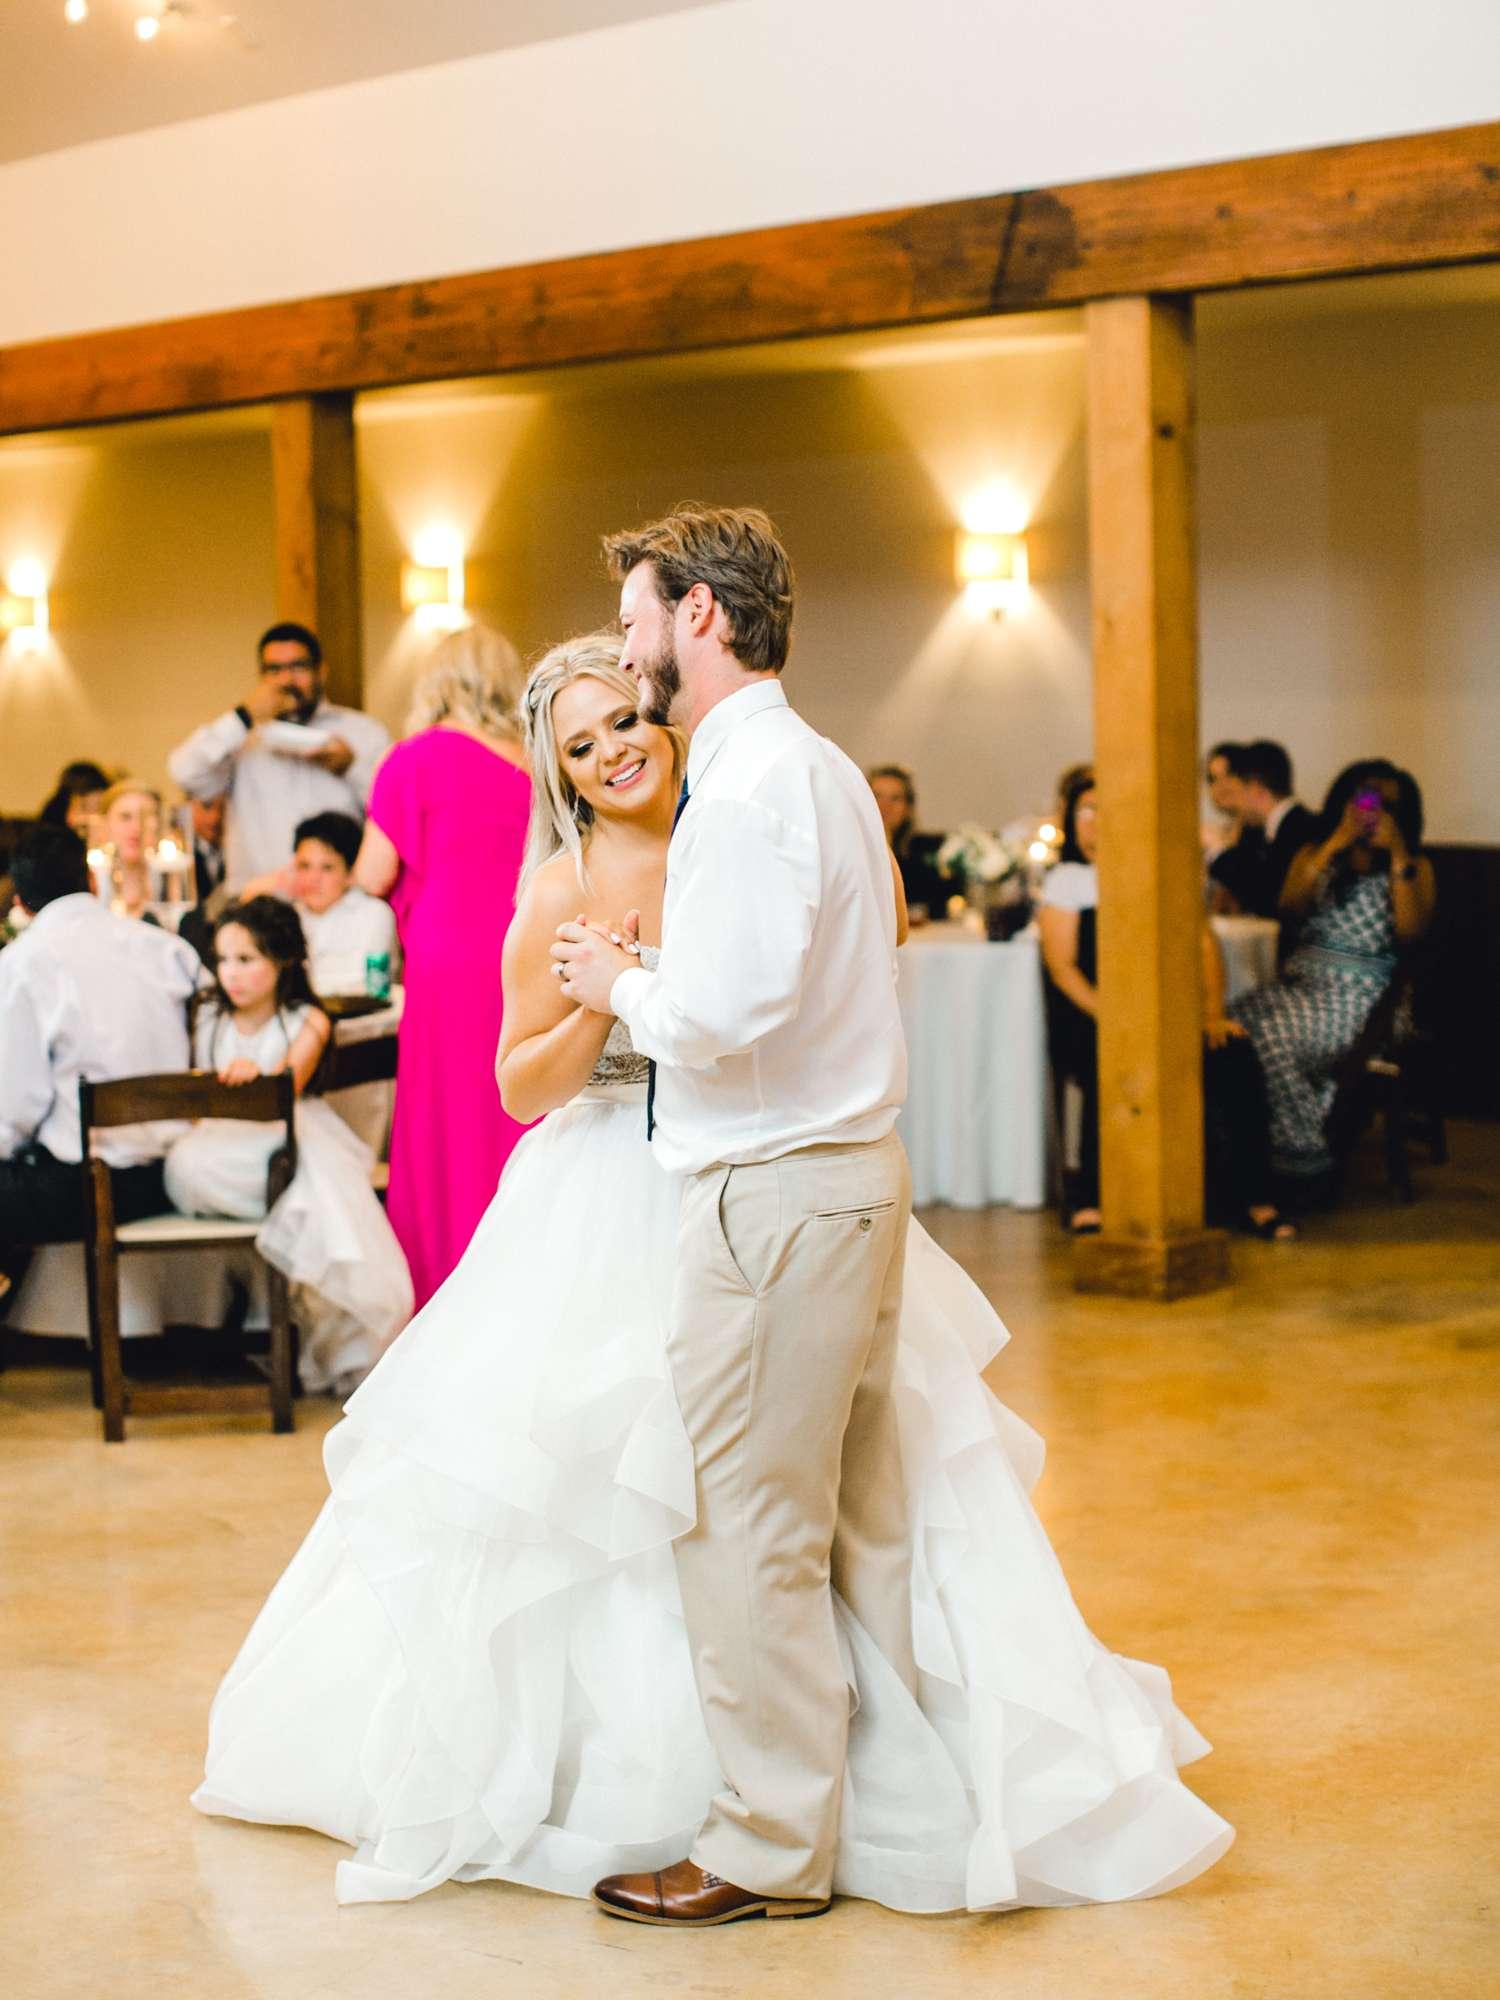 HAYLEE+JUSTIN+GREGORY+HERITAGE_HAUS_AUSTIN_TEXAS_WEDDING_0148.jpg